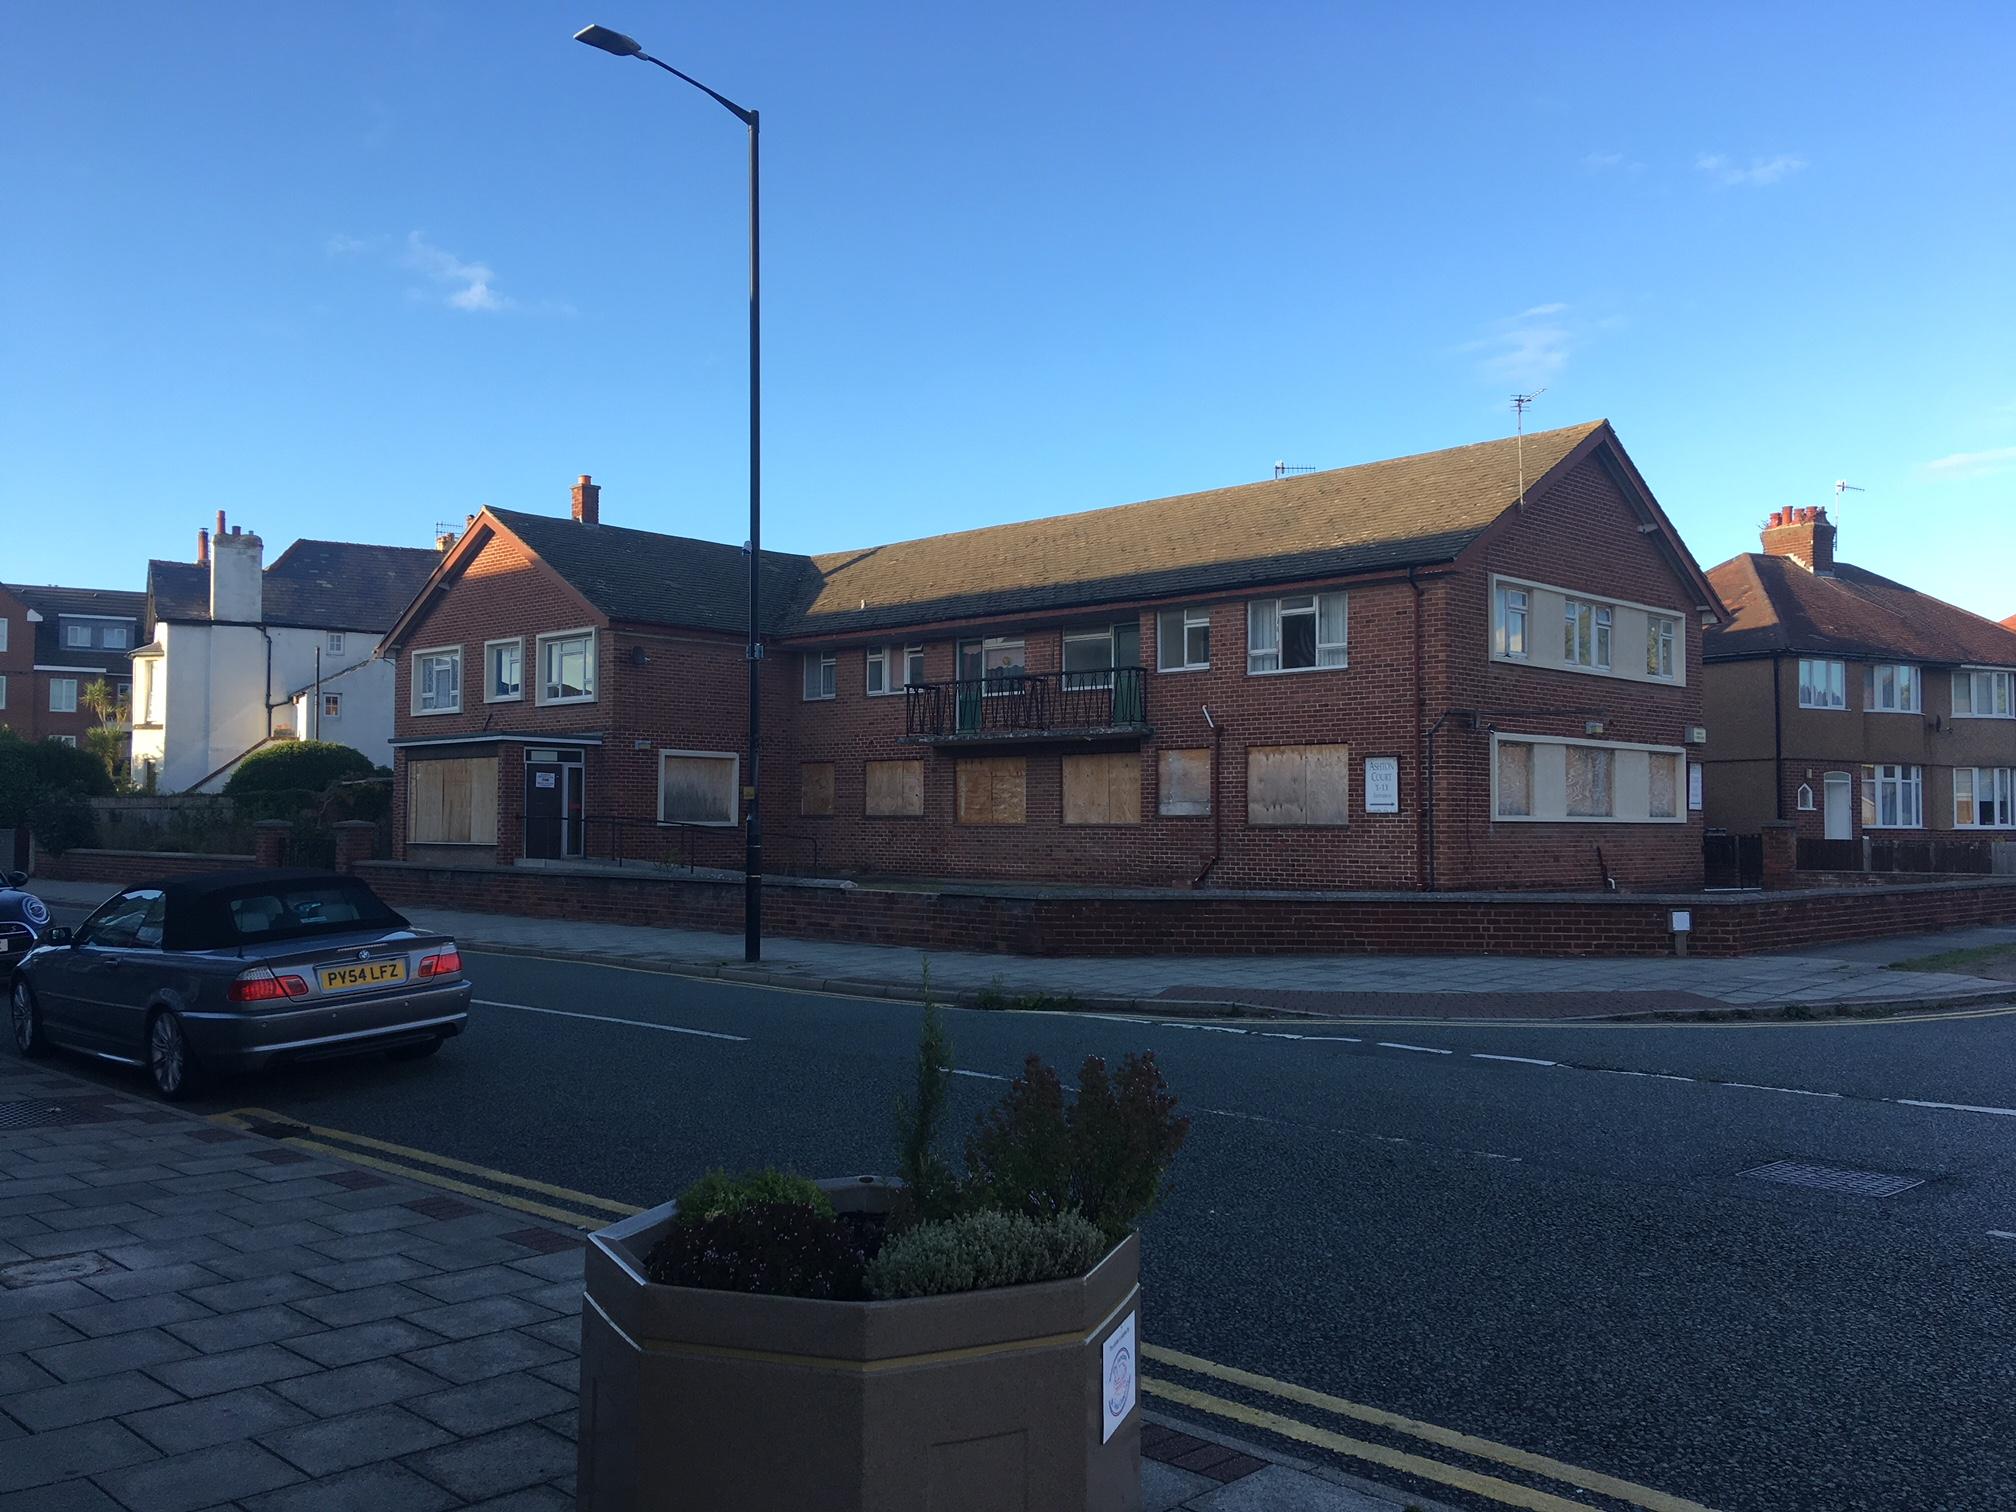 The former Ashton Court sheltered housing complex, earmarked for 14 properties